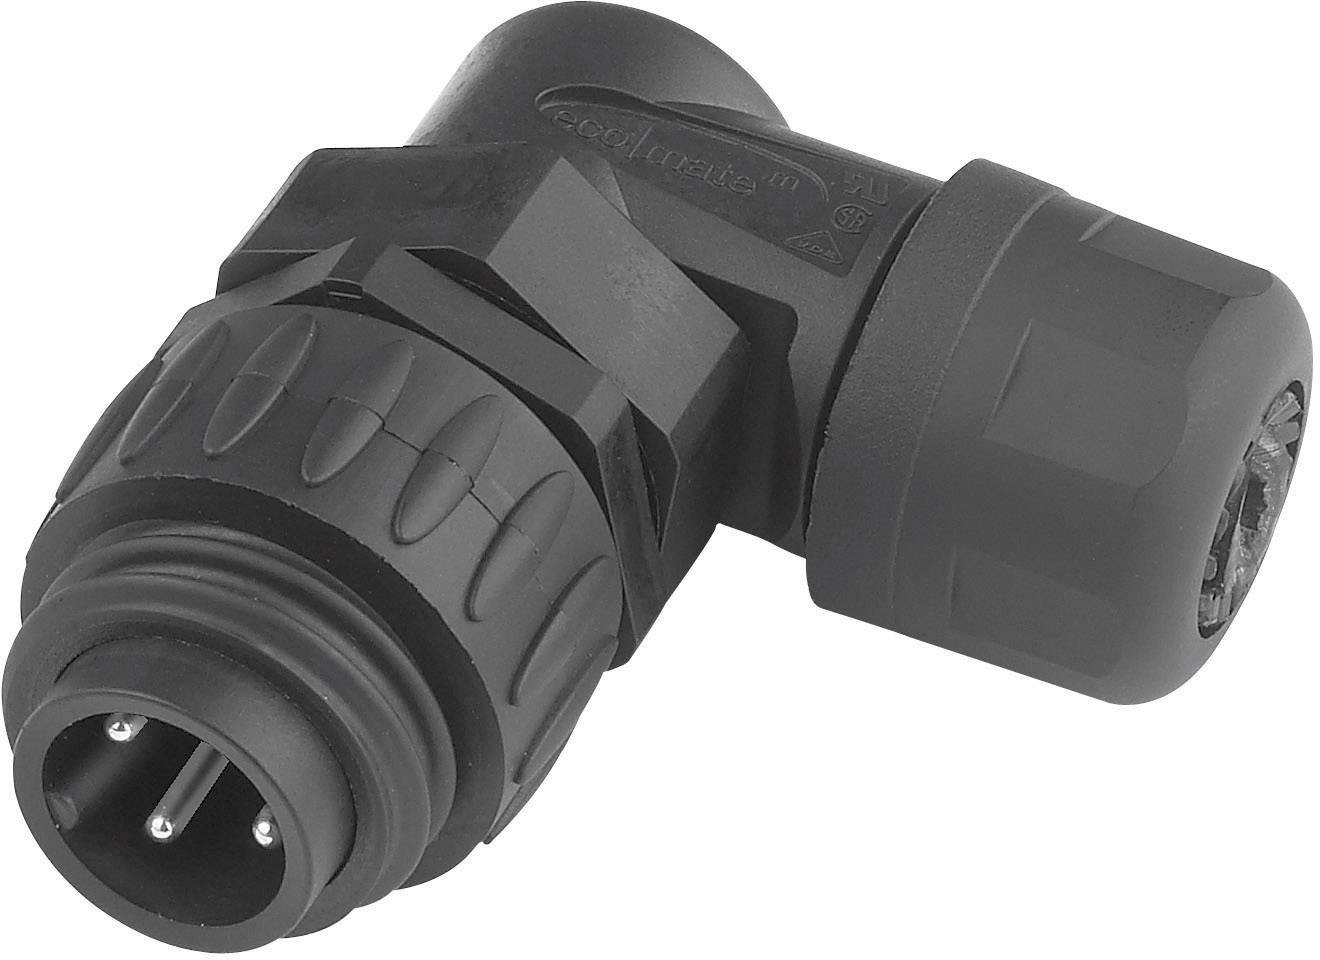 Kabelový konektor 6+PE Amphenol C016 30K006 100 12, černá, úhlový